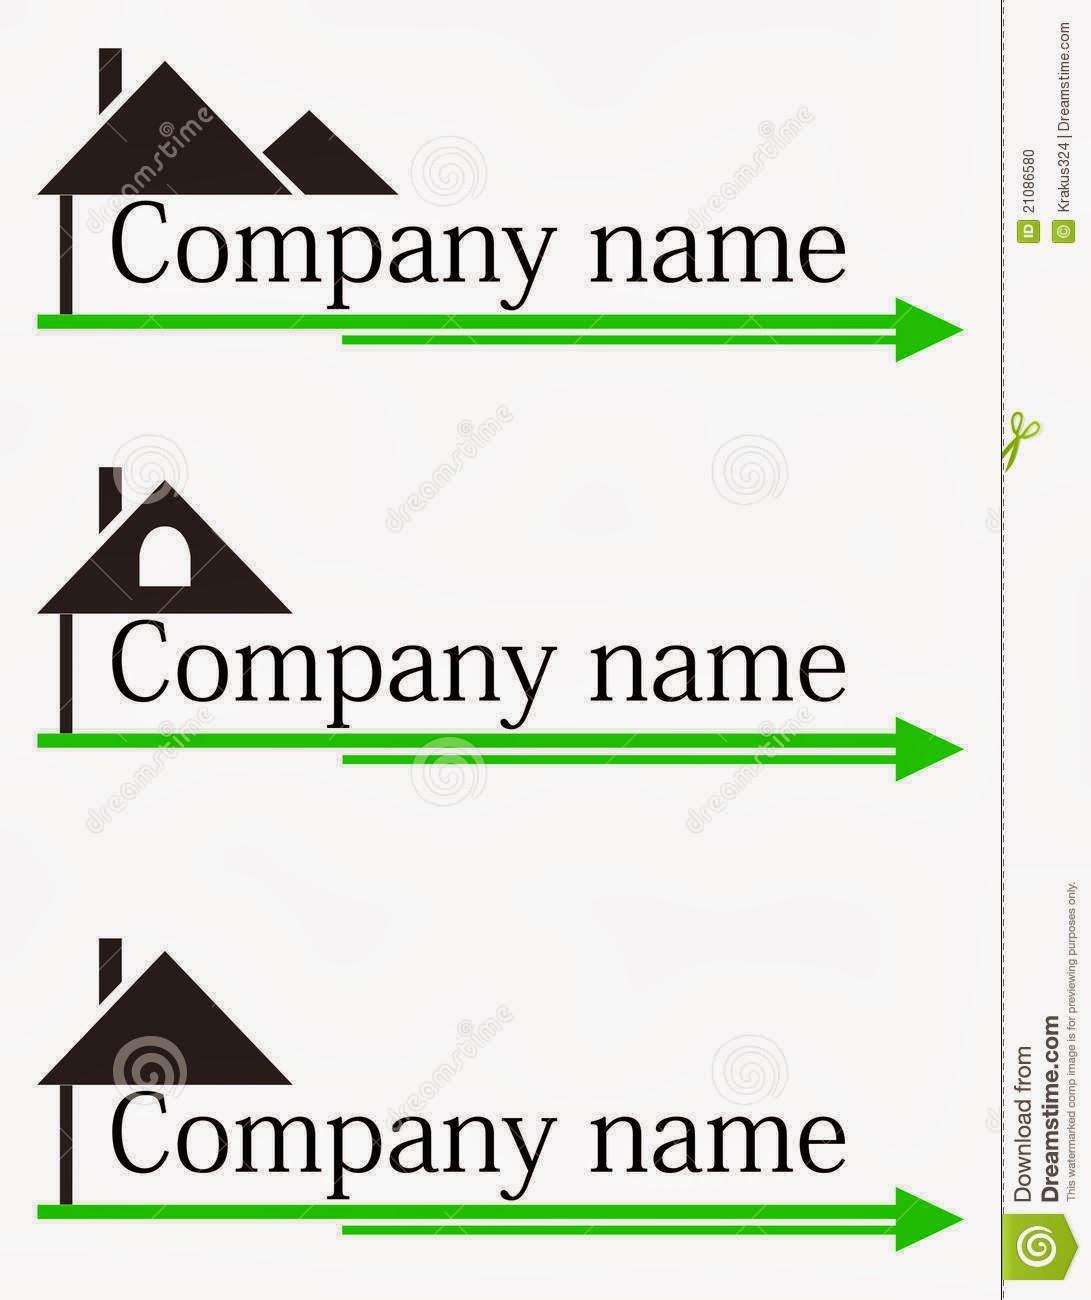 Building Company Logos - Automotive Car Center